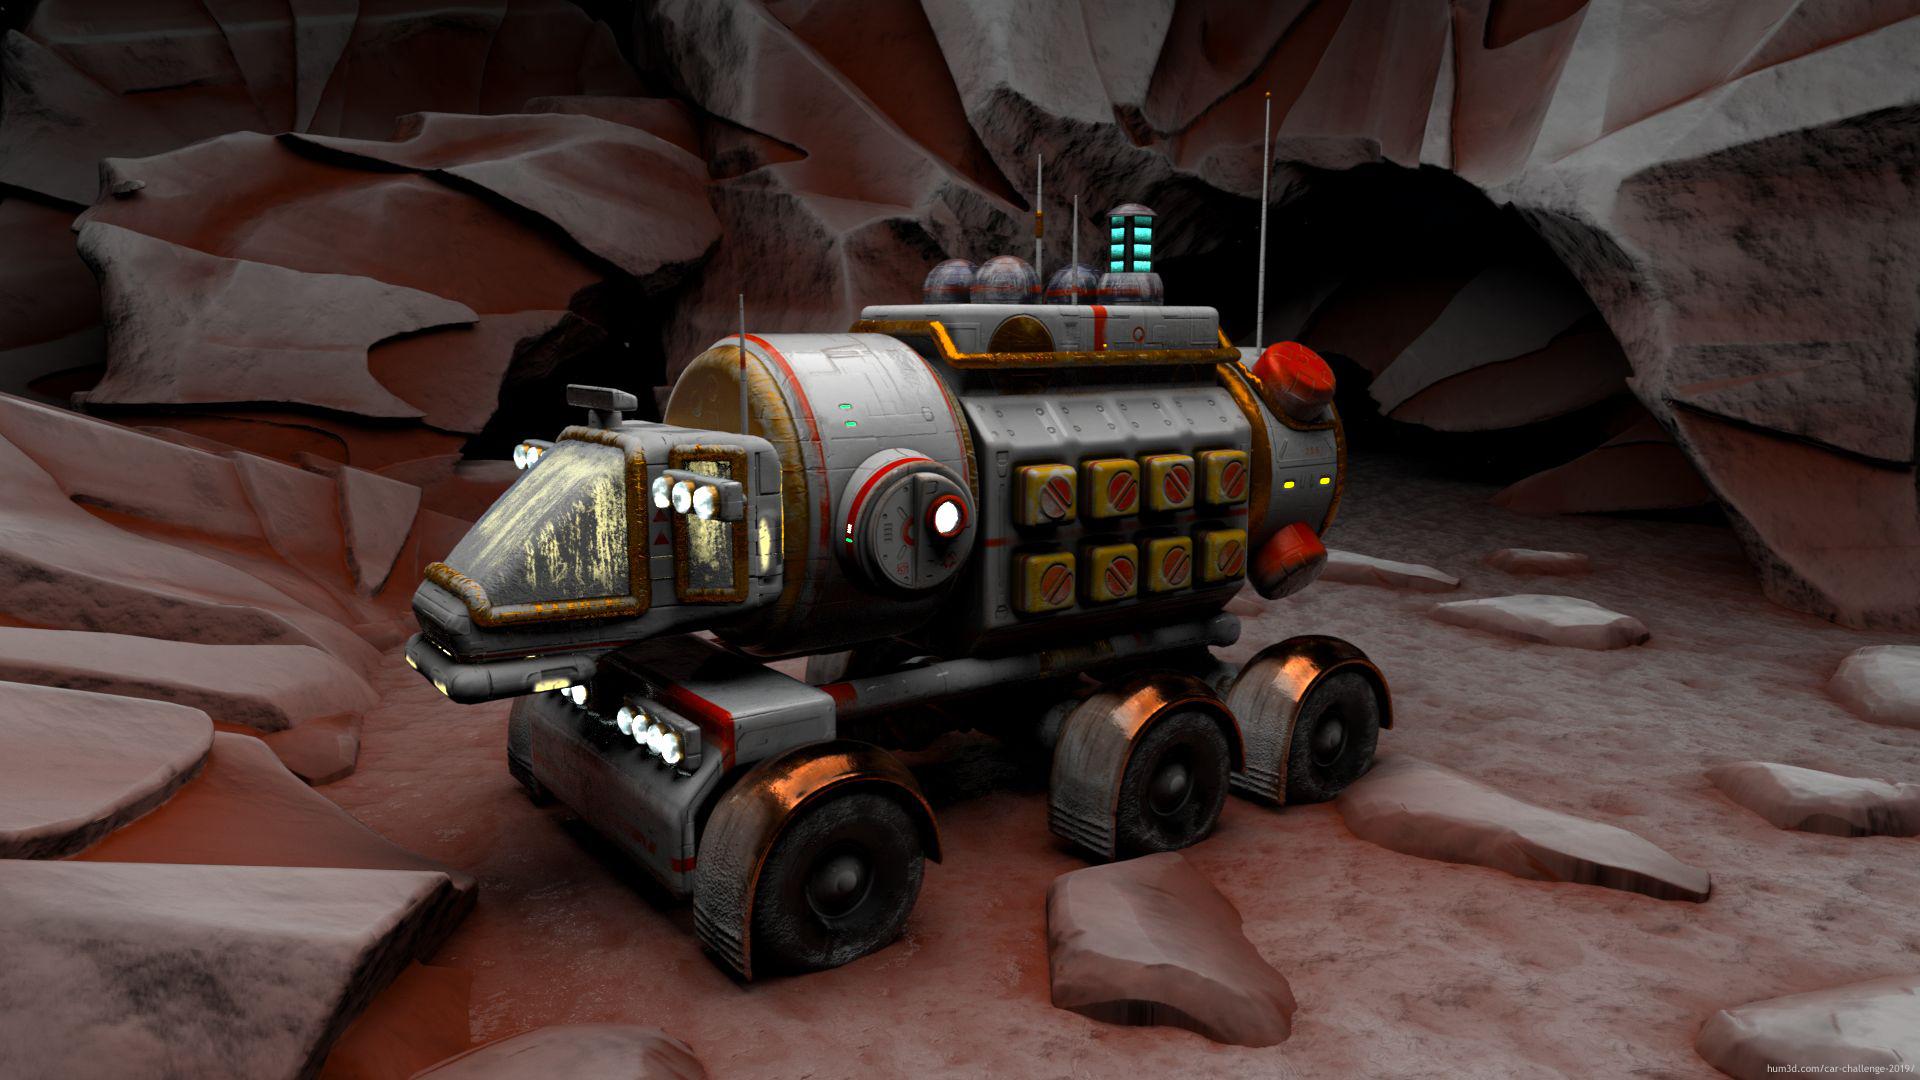 Planet explorer 3d art